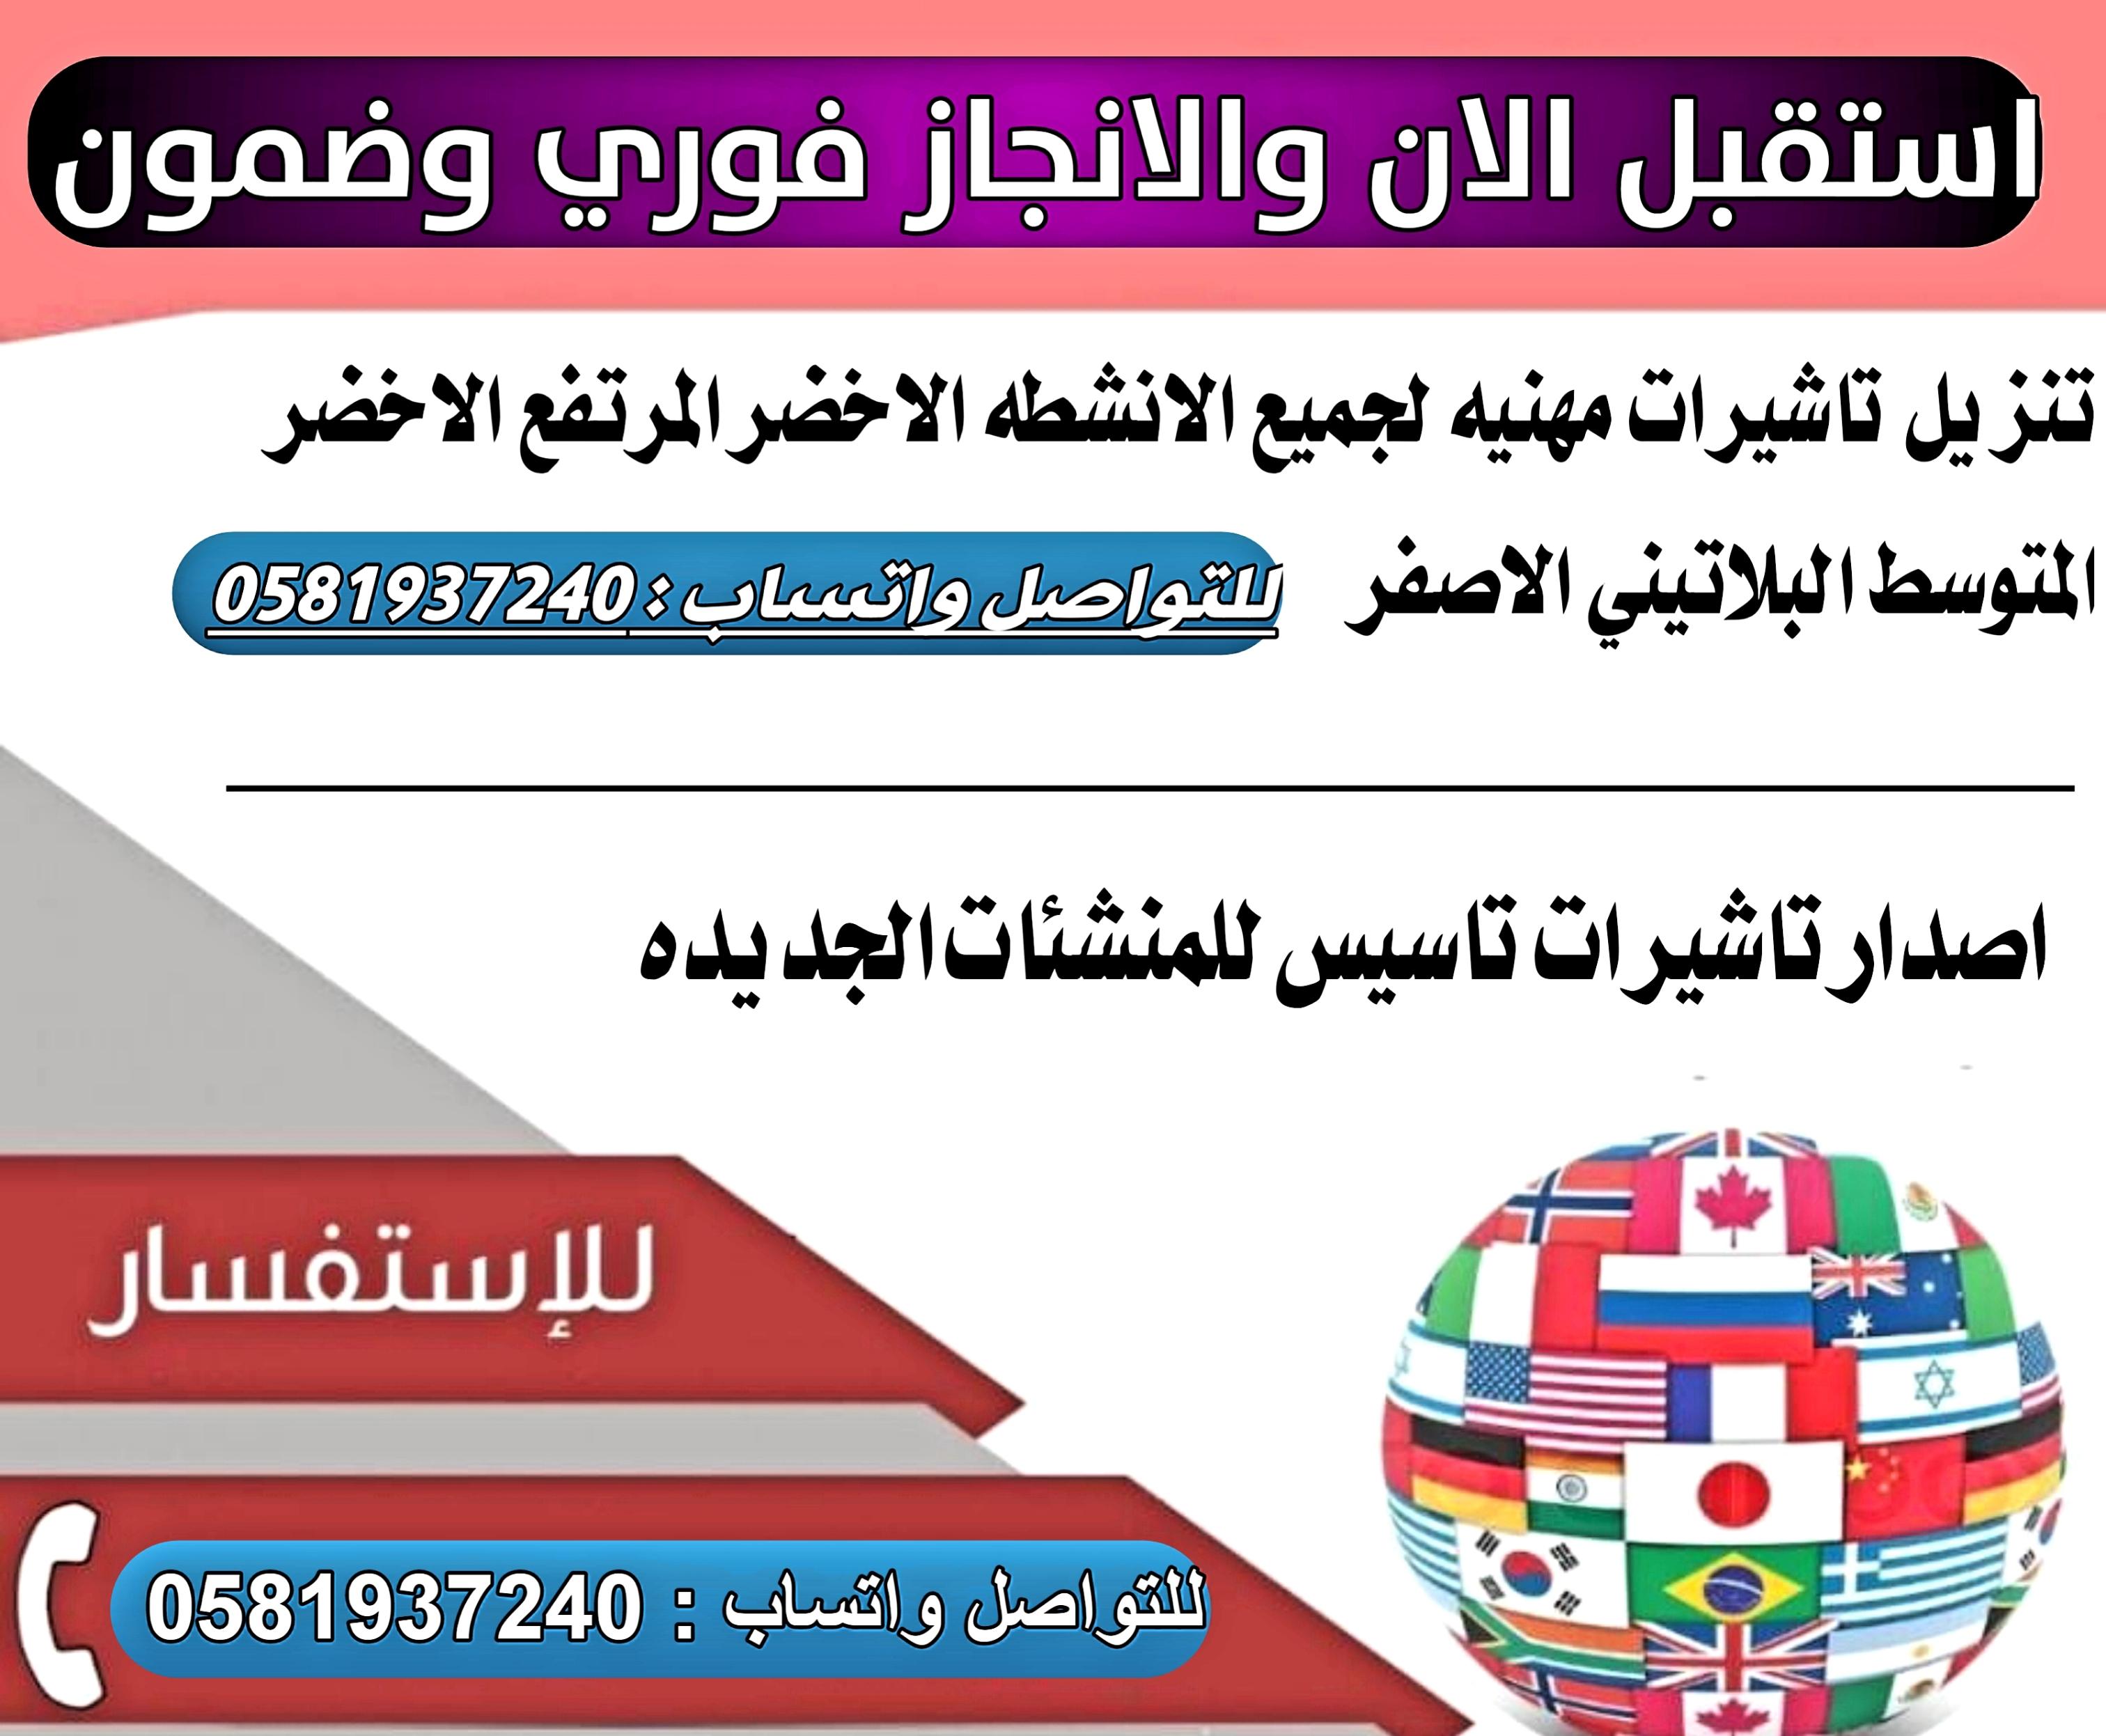 byani.info